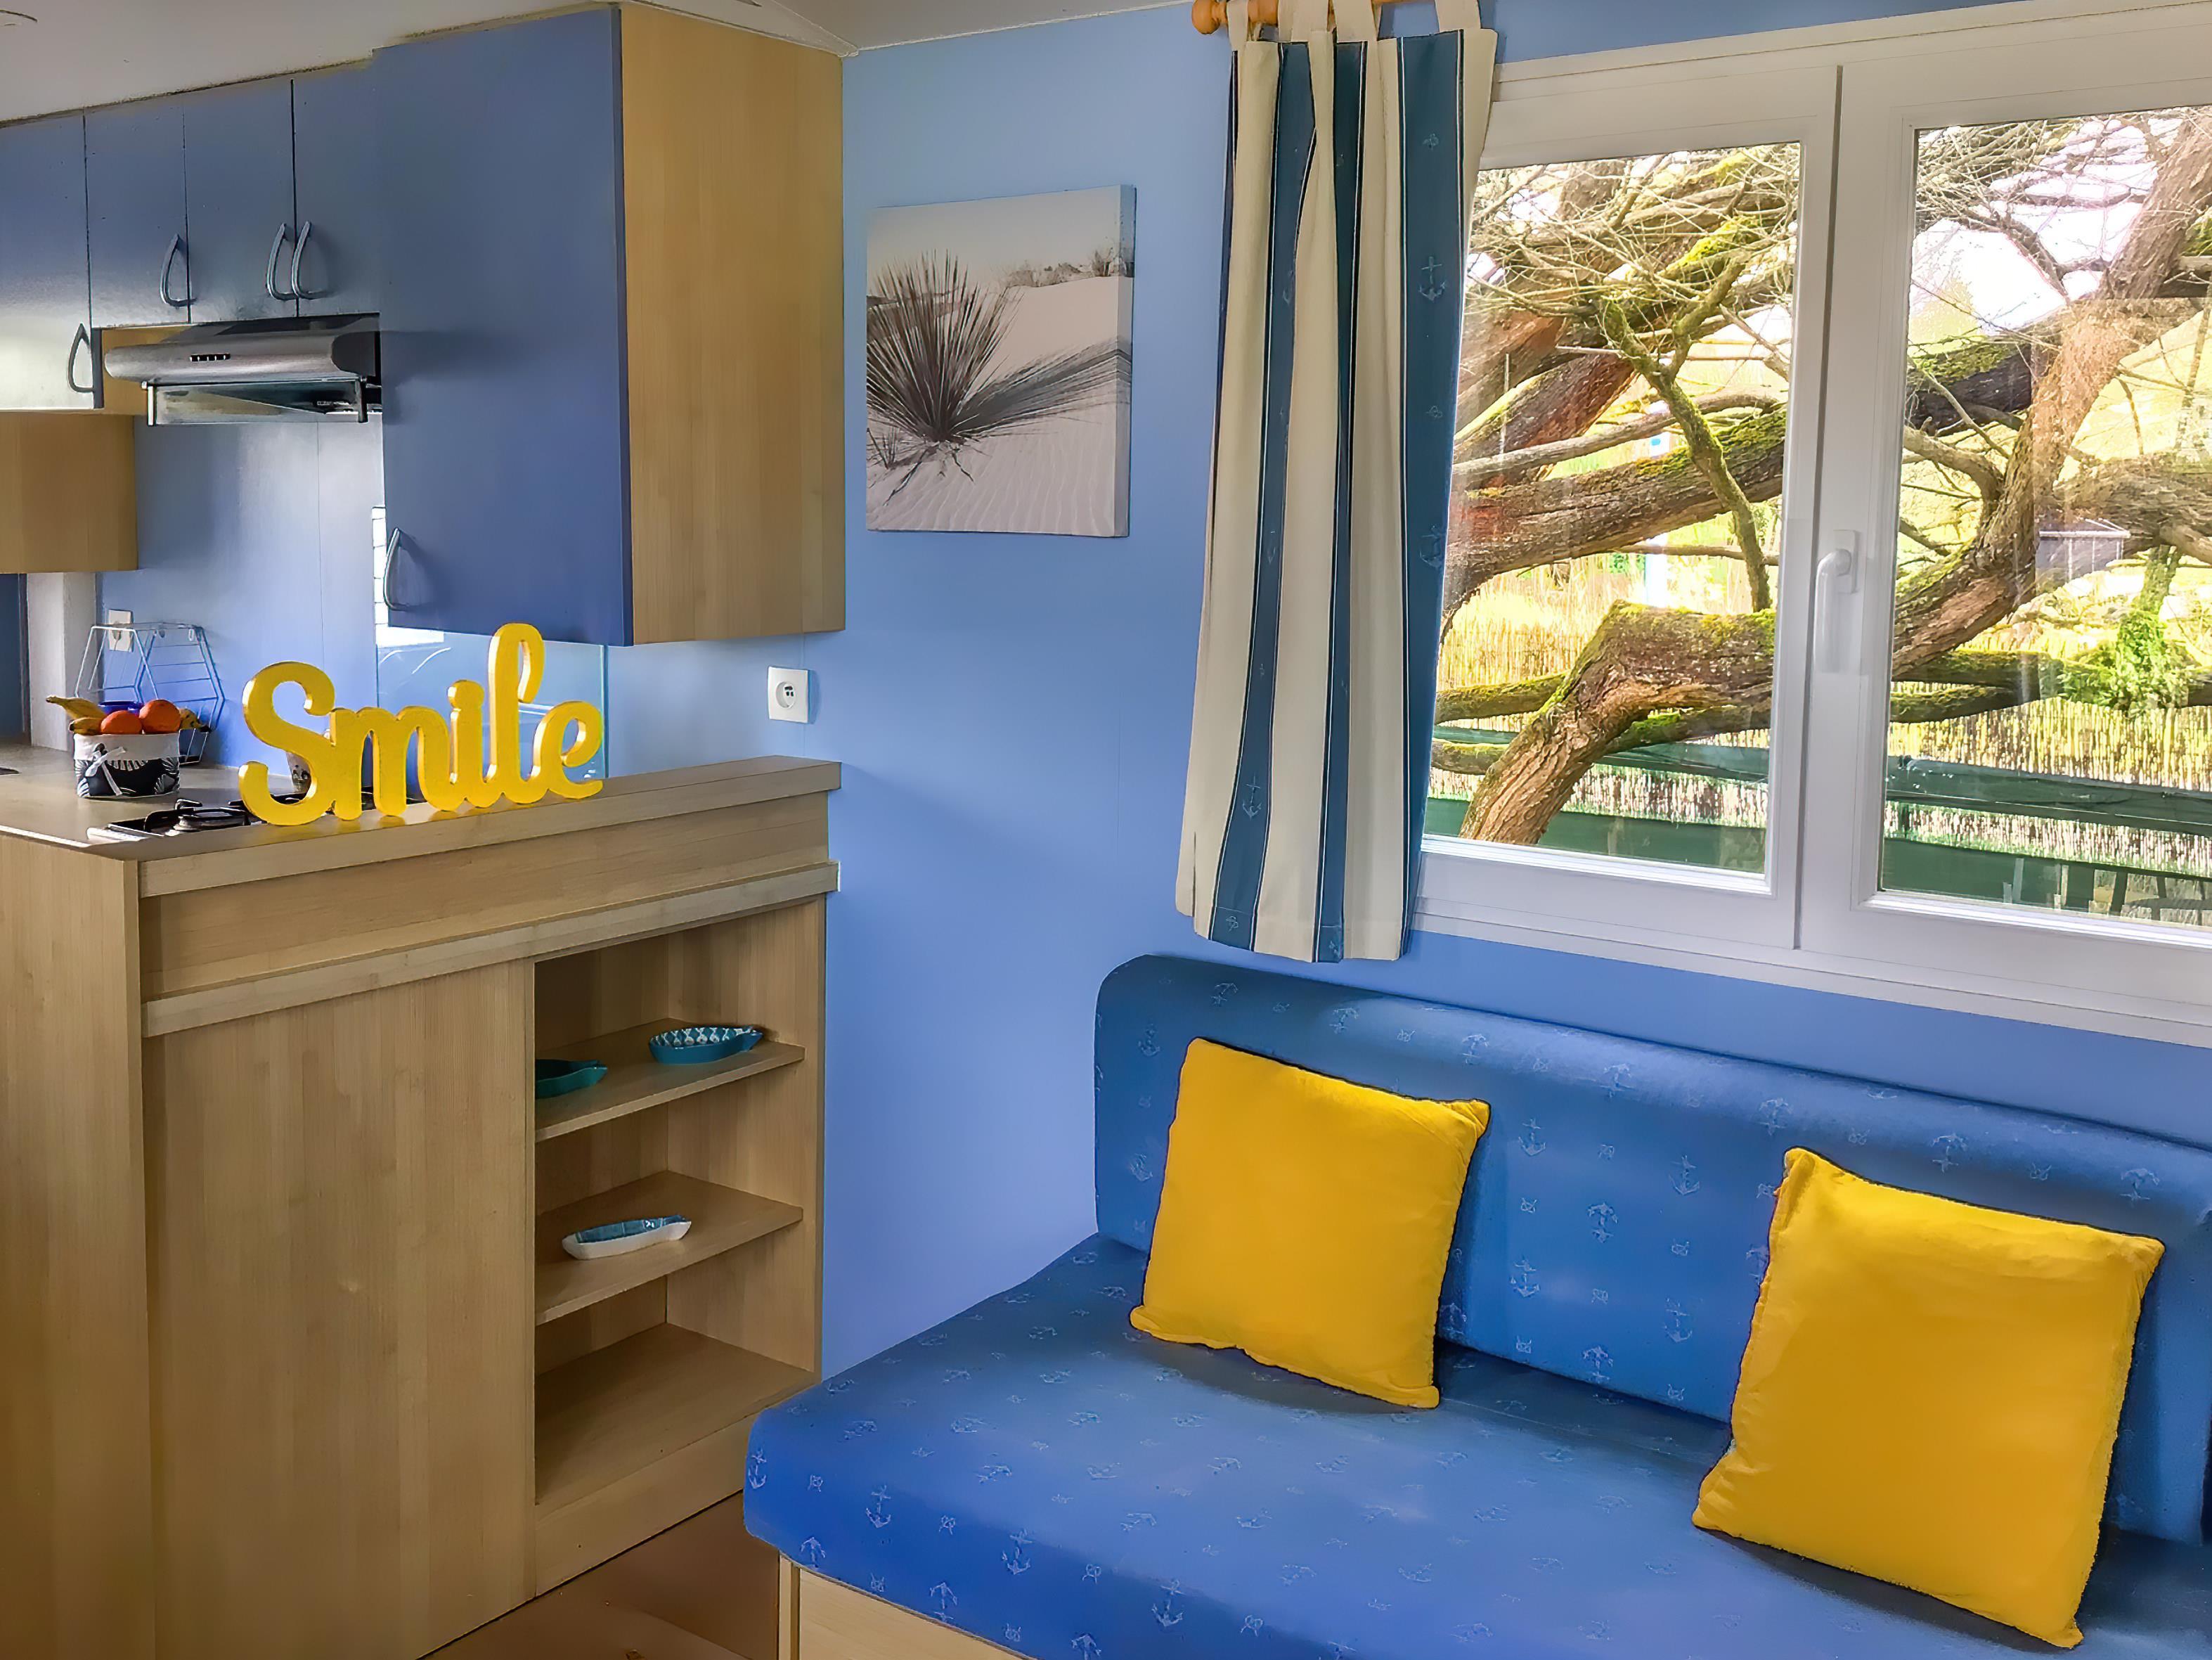 Location - Mobilhome 2 Chambres Confort + Avec Loggia - Camping Le Moulin des Oies